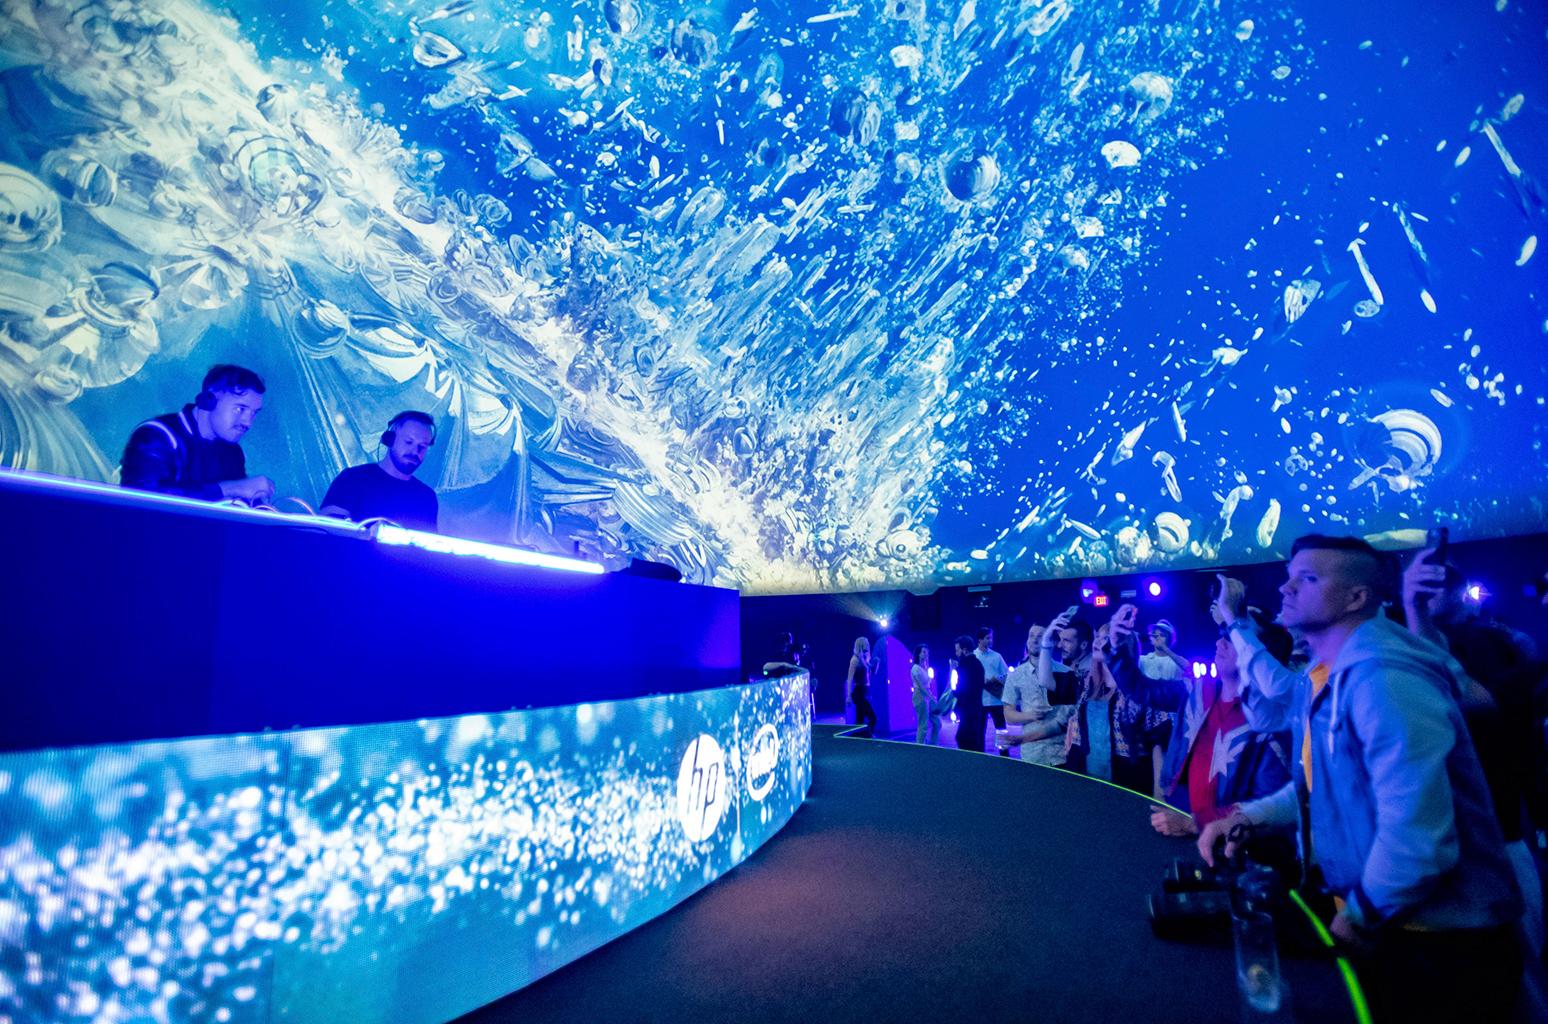 RUFUS-DU-SOLs-Underwater-coachella-2019-billboard-1548.jpg